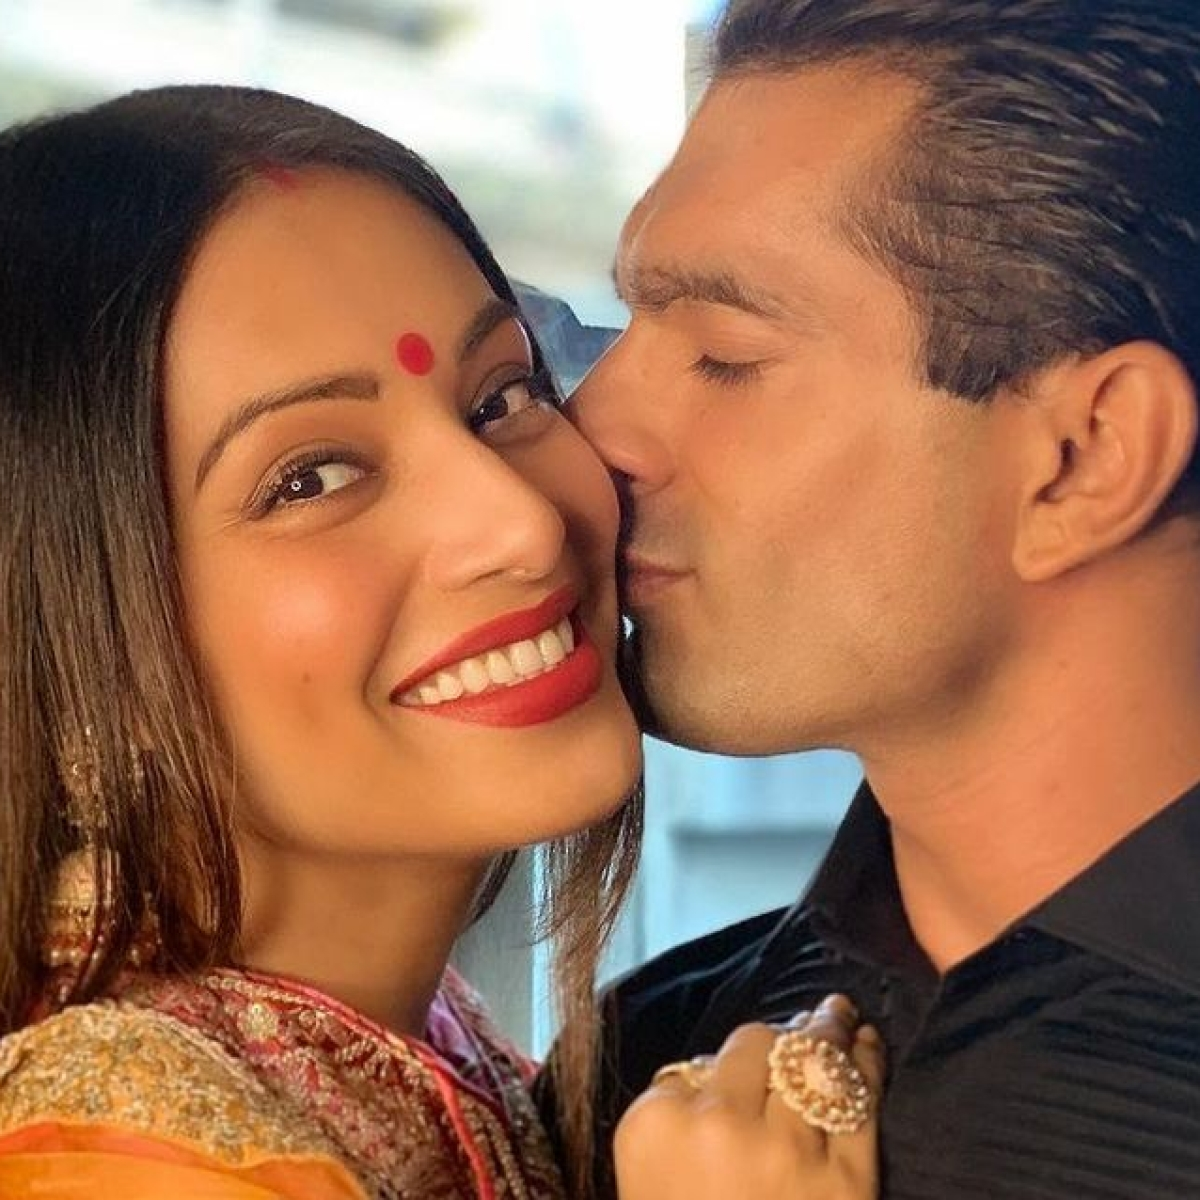 Bipasha Basu Birthday Special: A look at the Bong beauty's love story with husband Karan Singh Grover